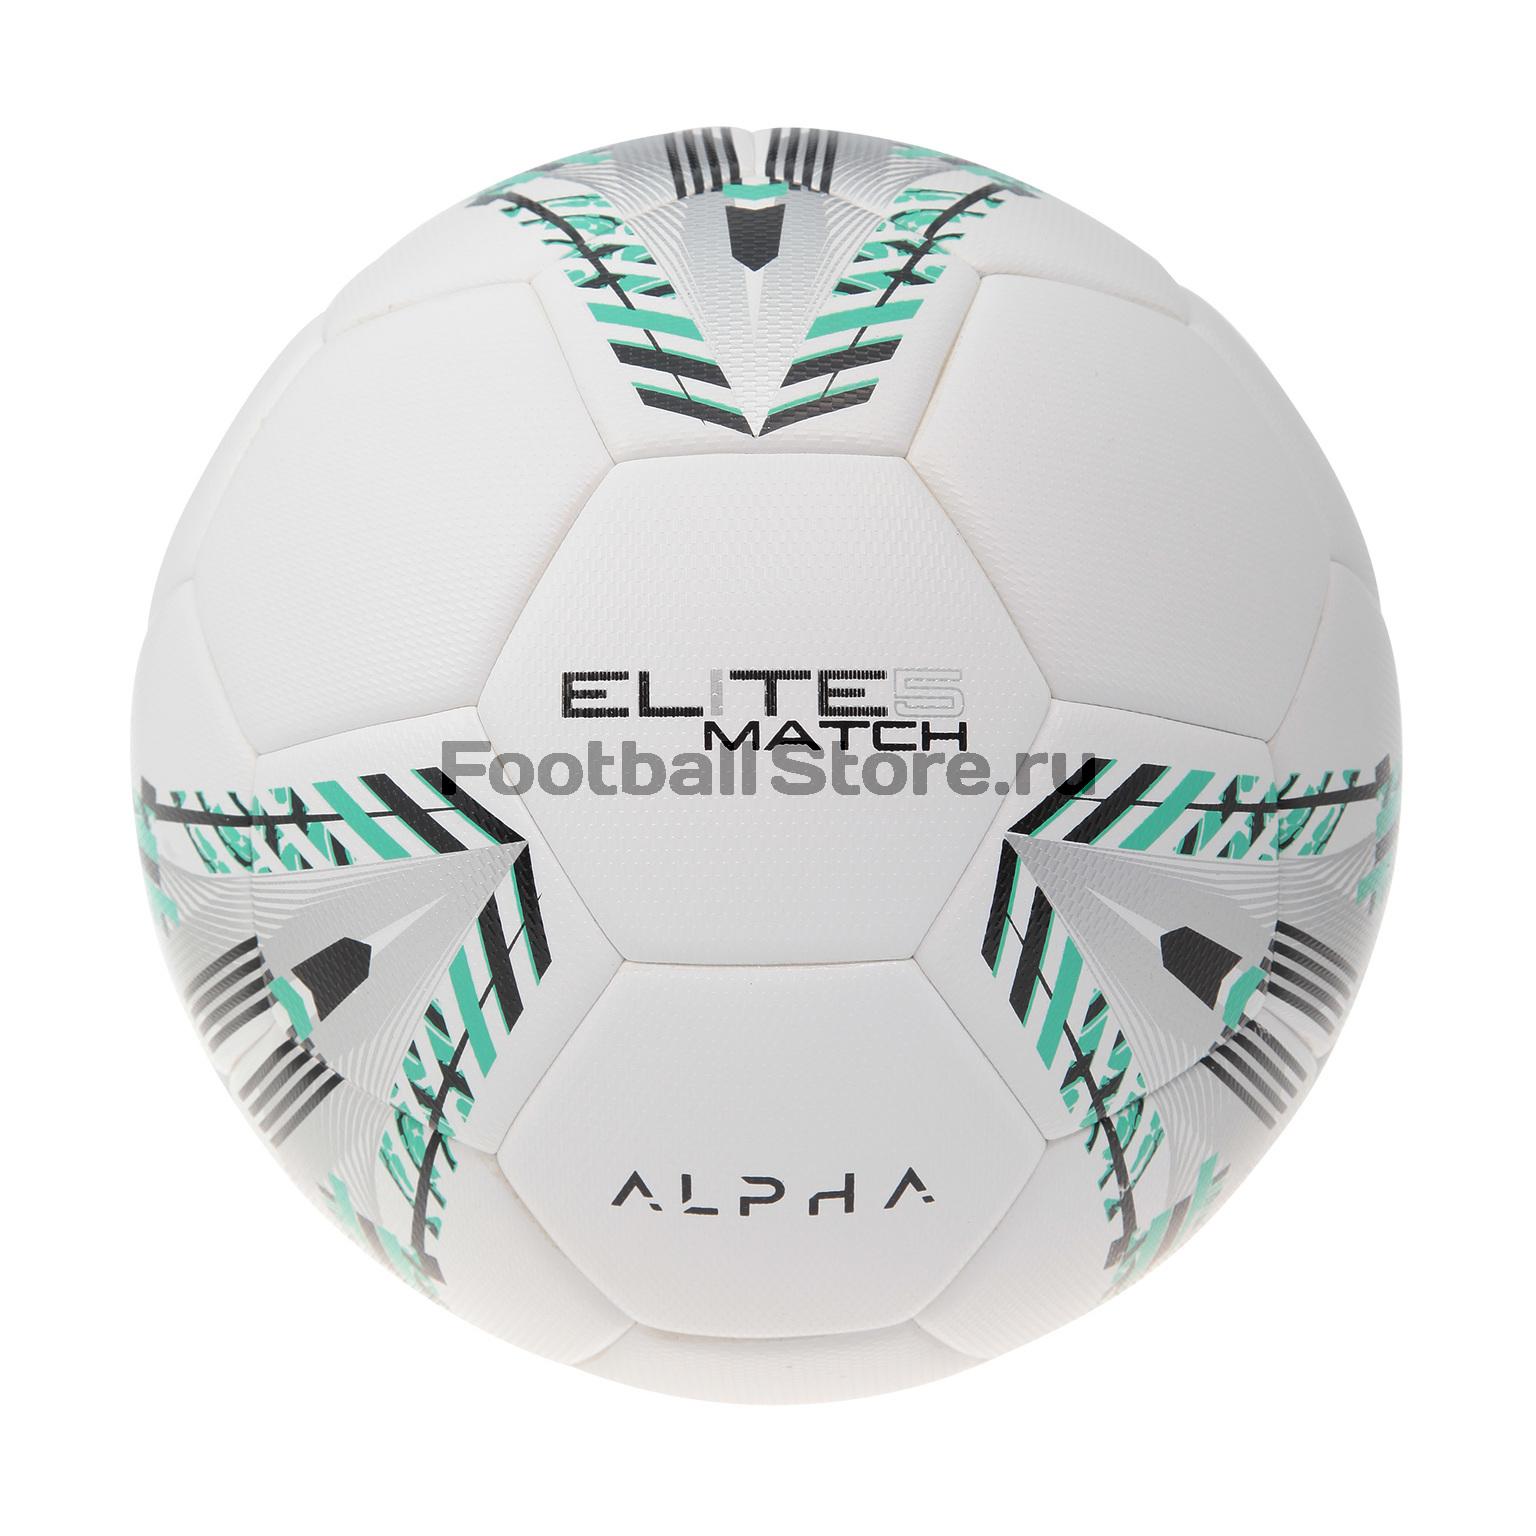 Футбольный мяч AlphaKeepers Elite Match 81017M5 футбольный мяч alpha keepers pro game 83017